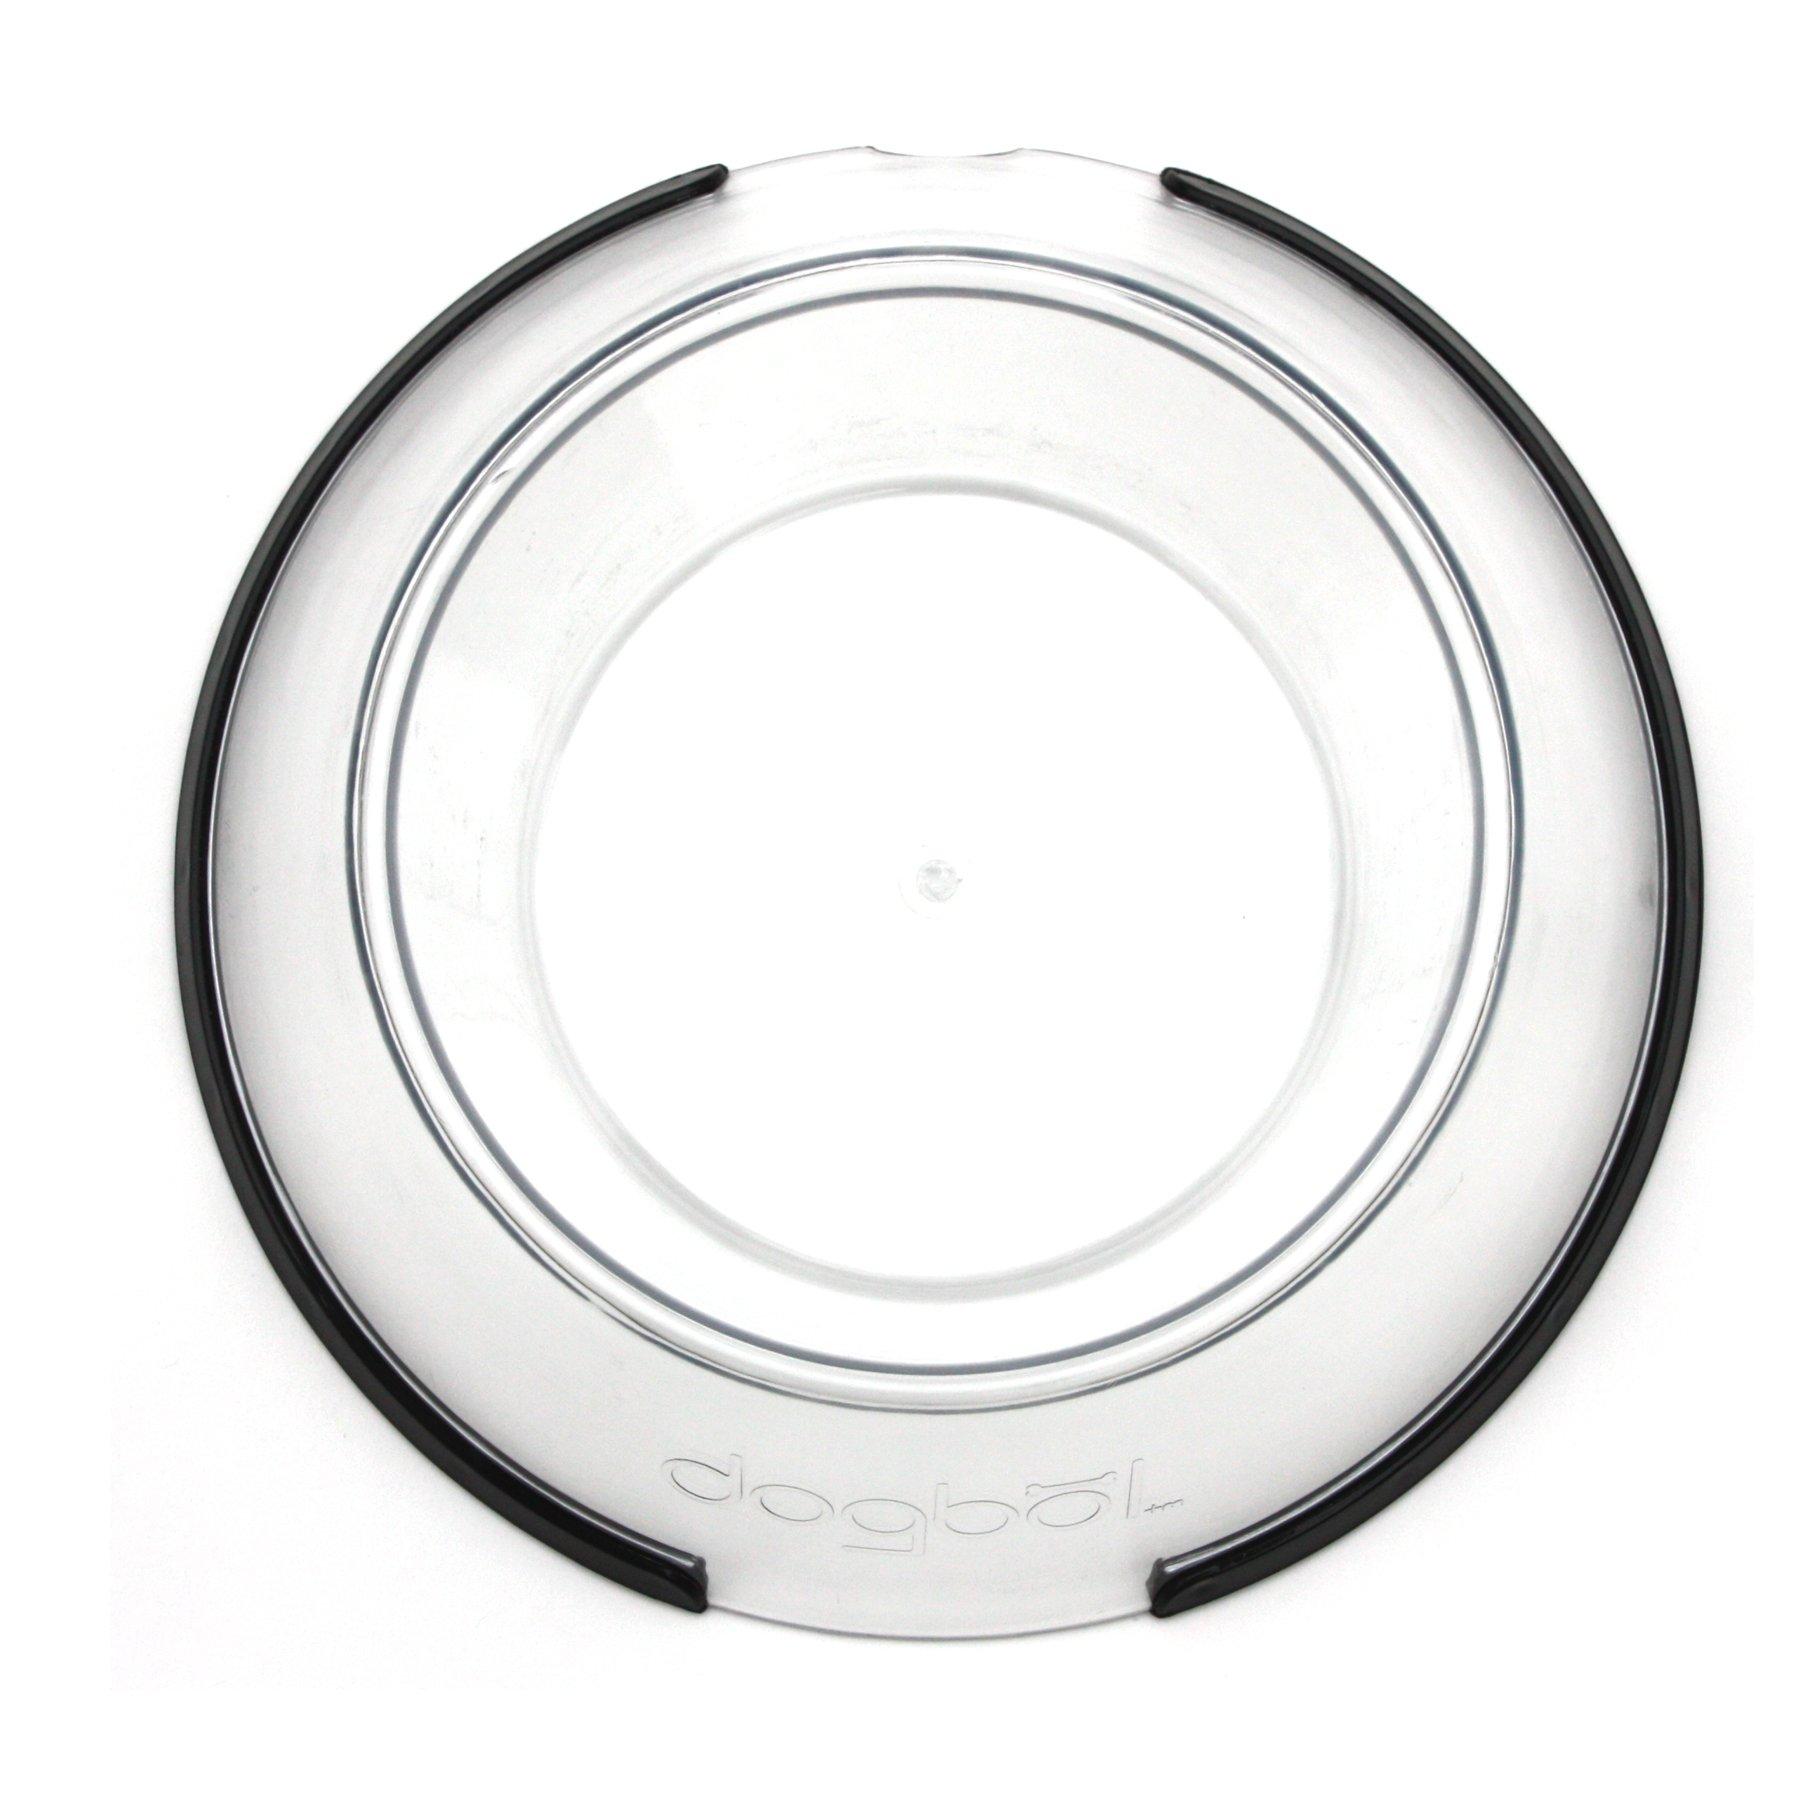 petprojekt Large Dogbol, Dog Dish, Clear by PetProjekt (Image #1)